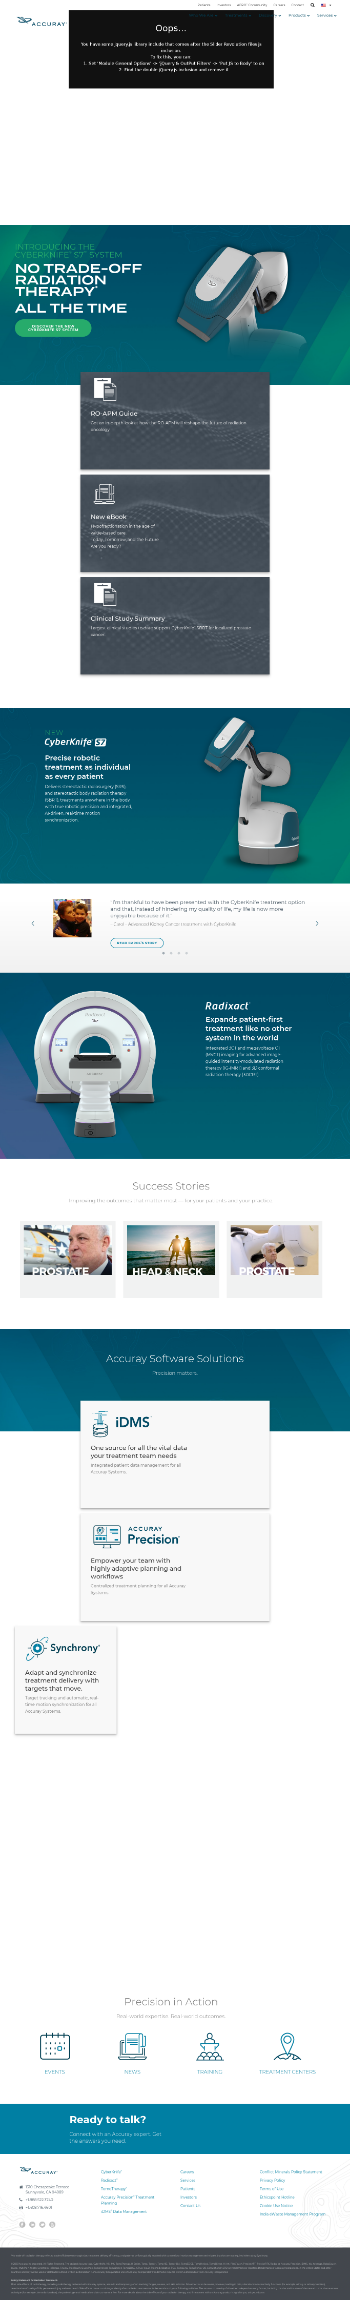 Accuray Incorporated Website Screenshot